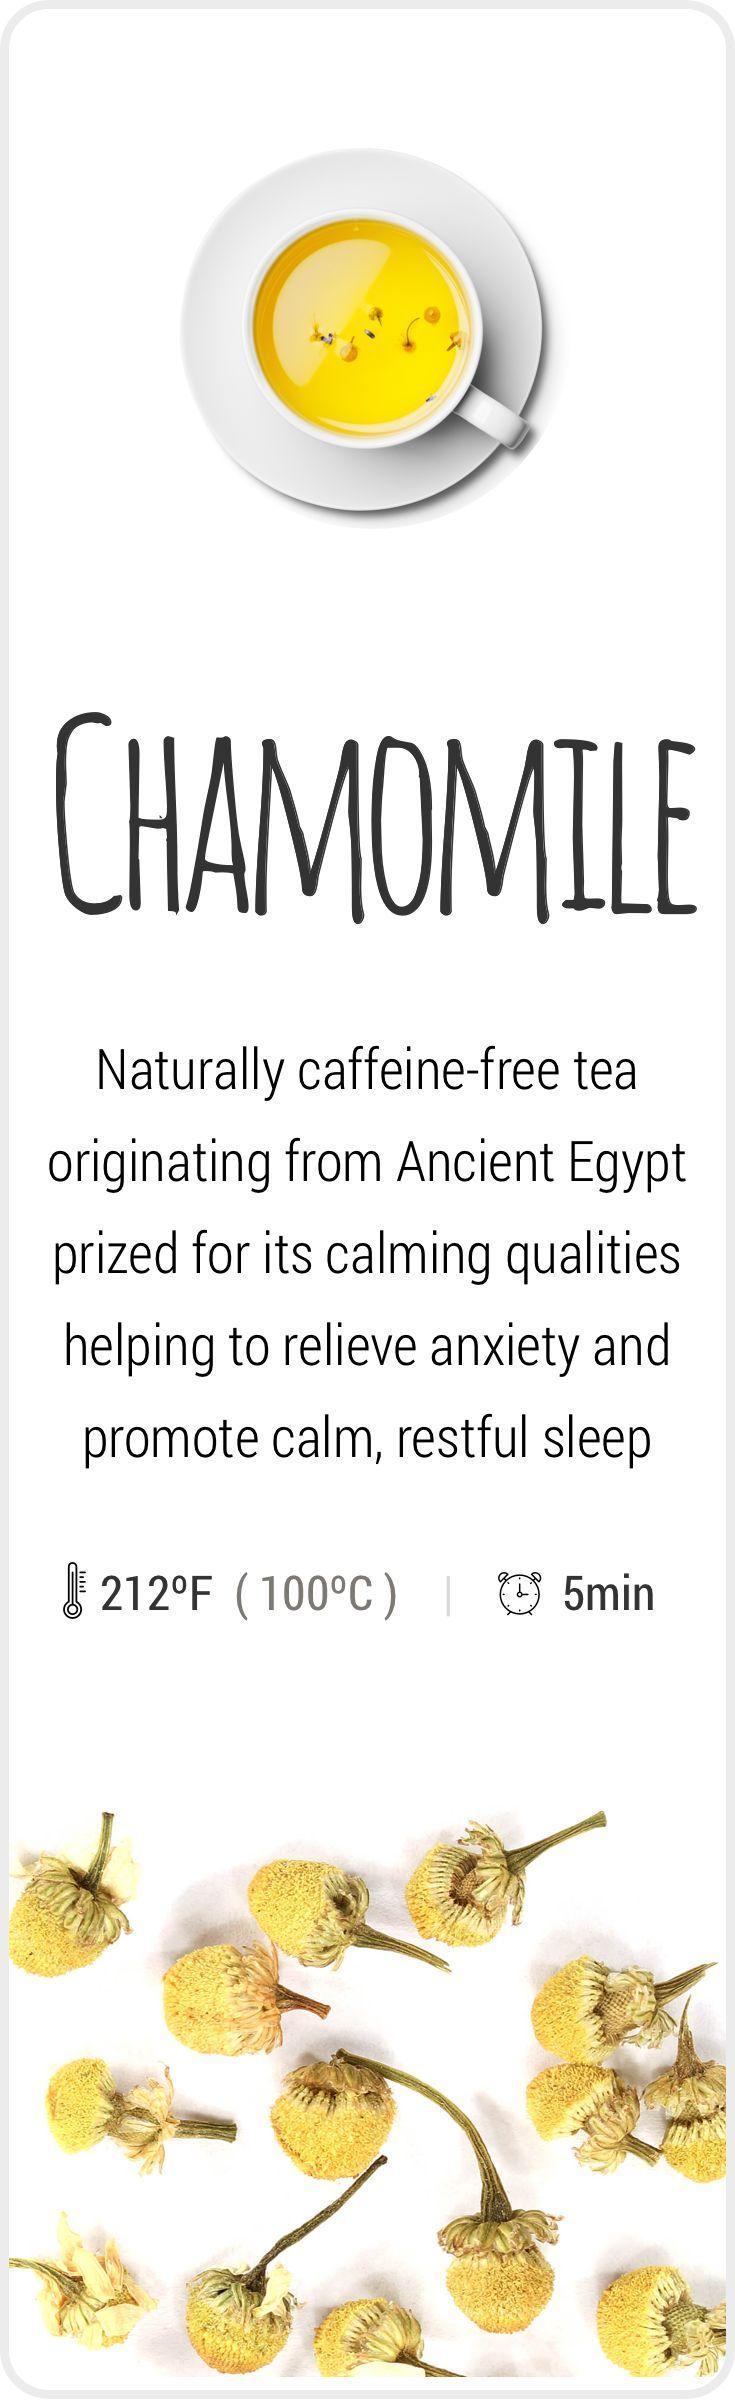 Chamomile in 2019 Chamomile tea, Caffeine free tea, Tea